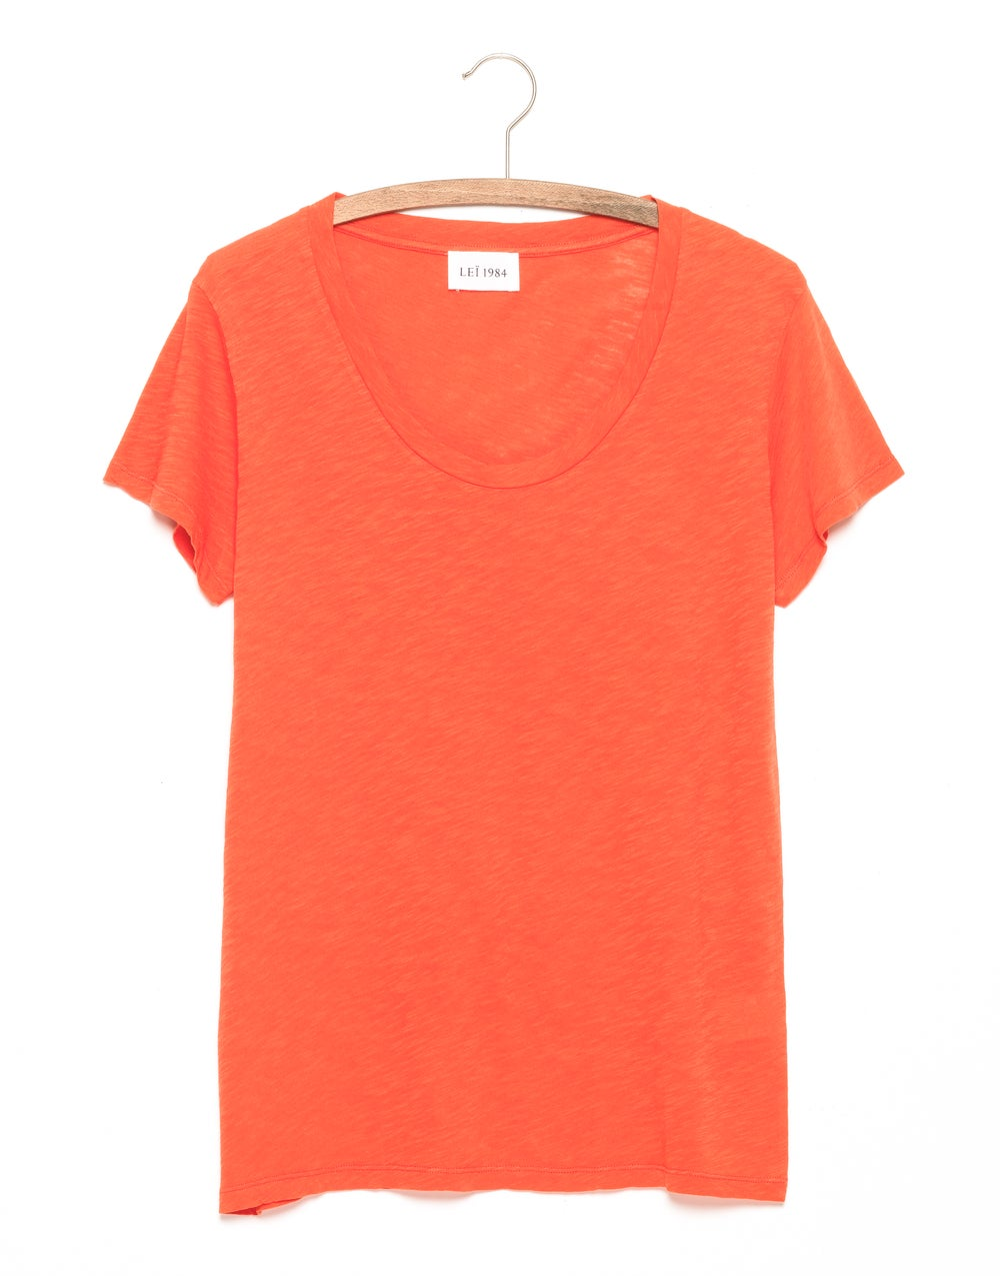 Image of Tee shirt flamé AMELIA coloris primaires 45€ -50%